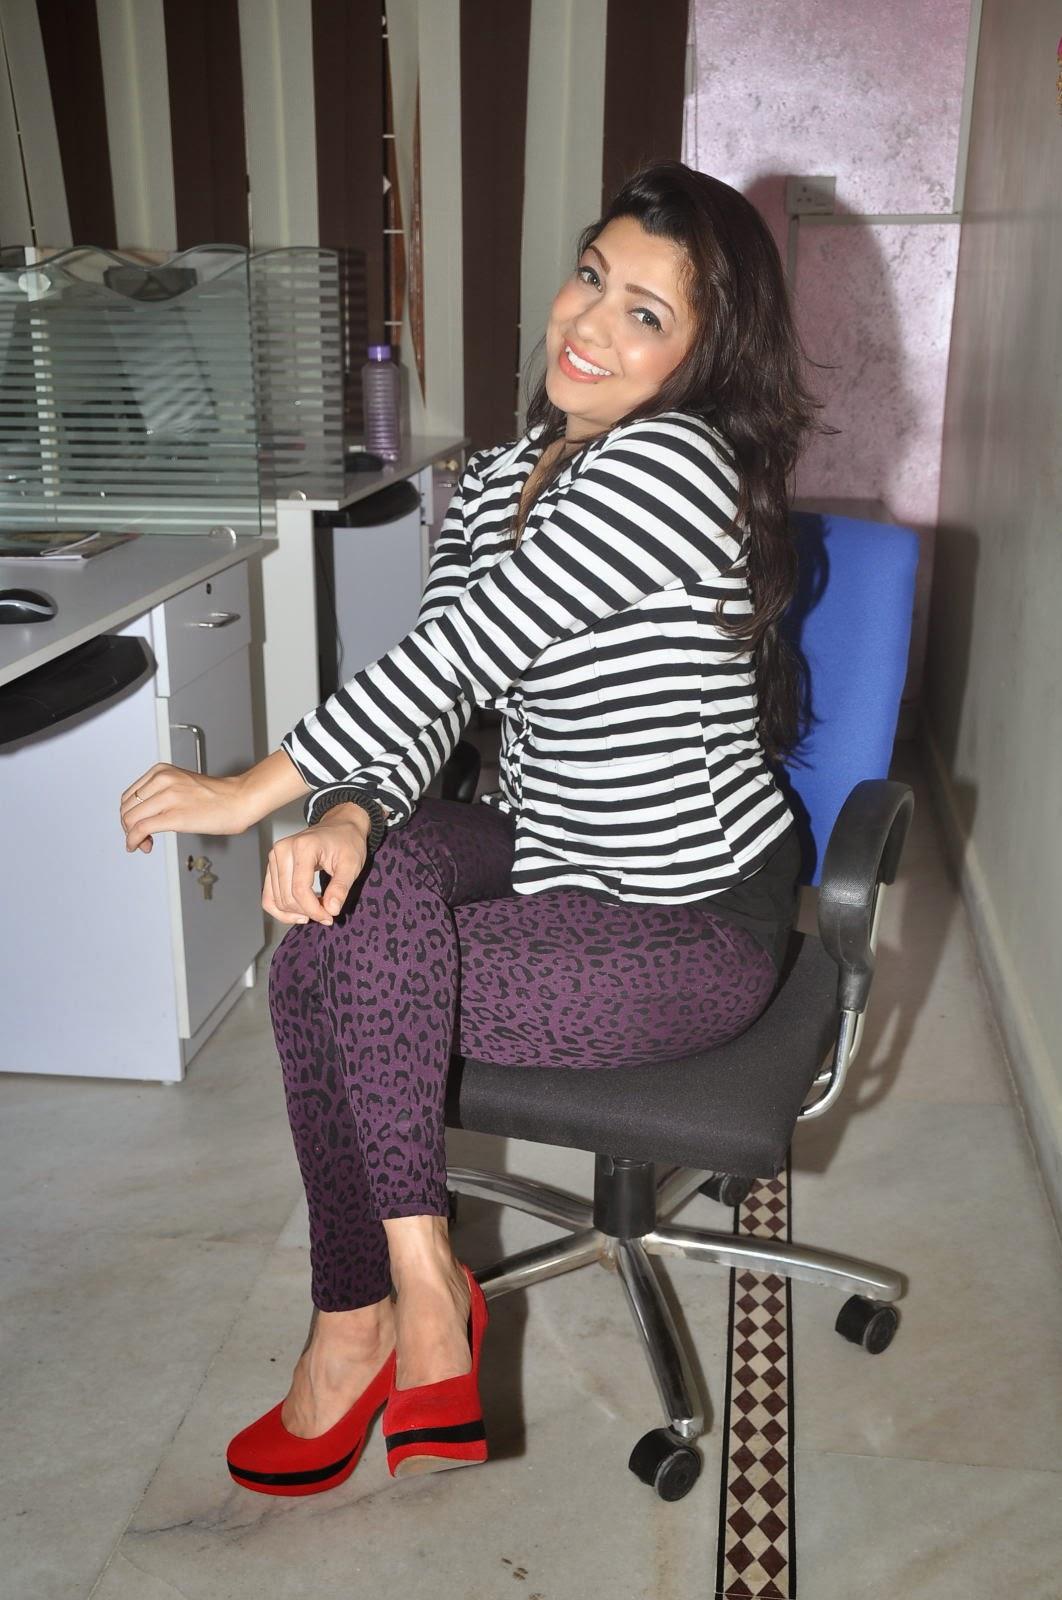 Actress Pari Nidhi Glam photos Gallery-HQ-Photo-6